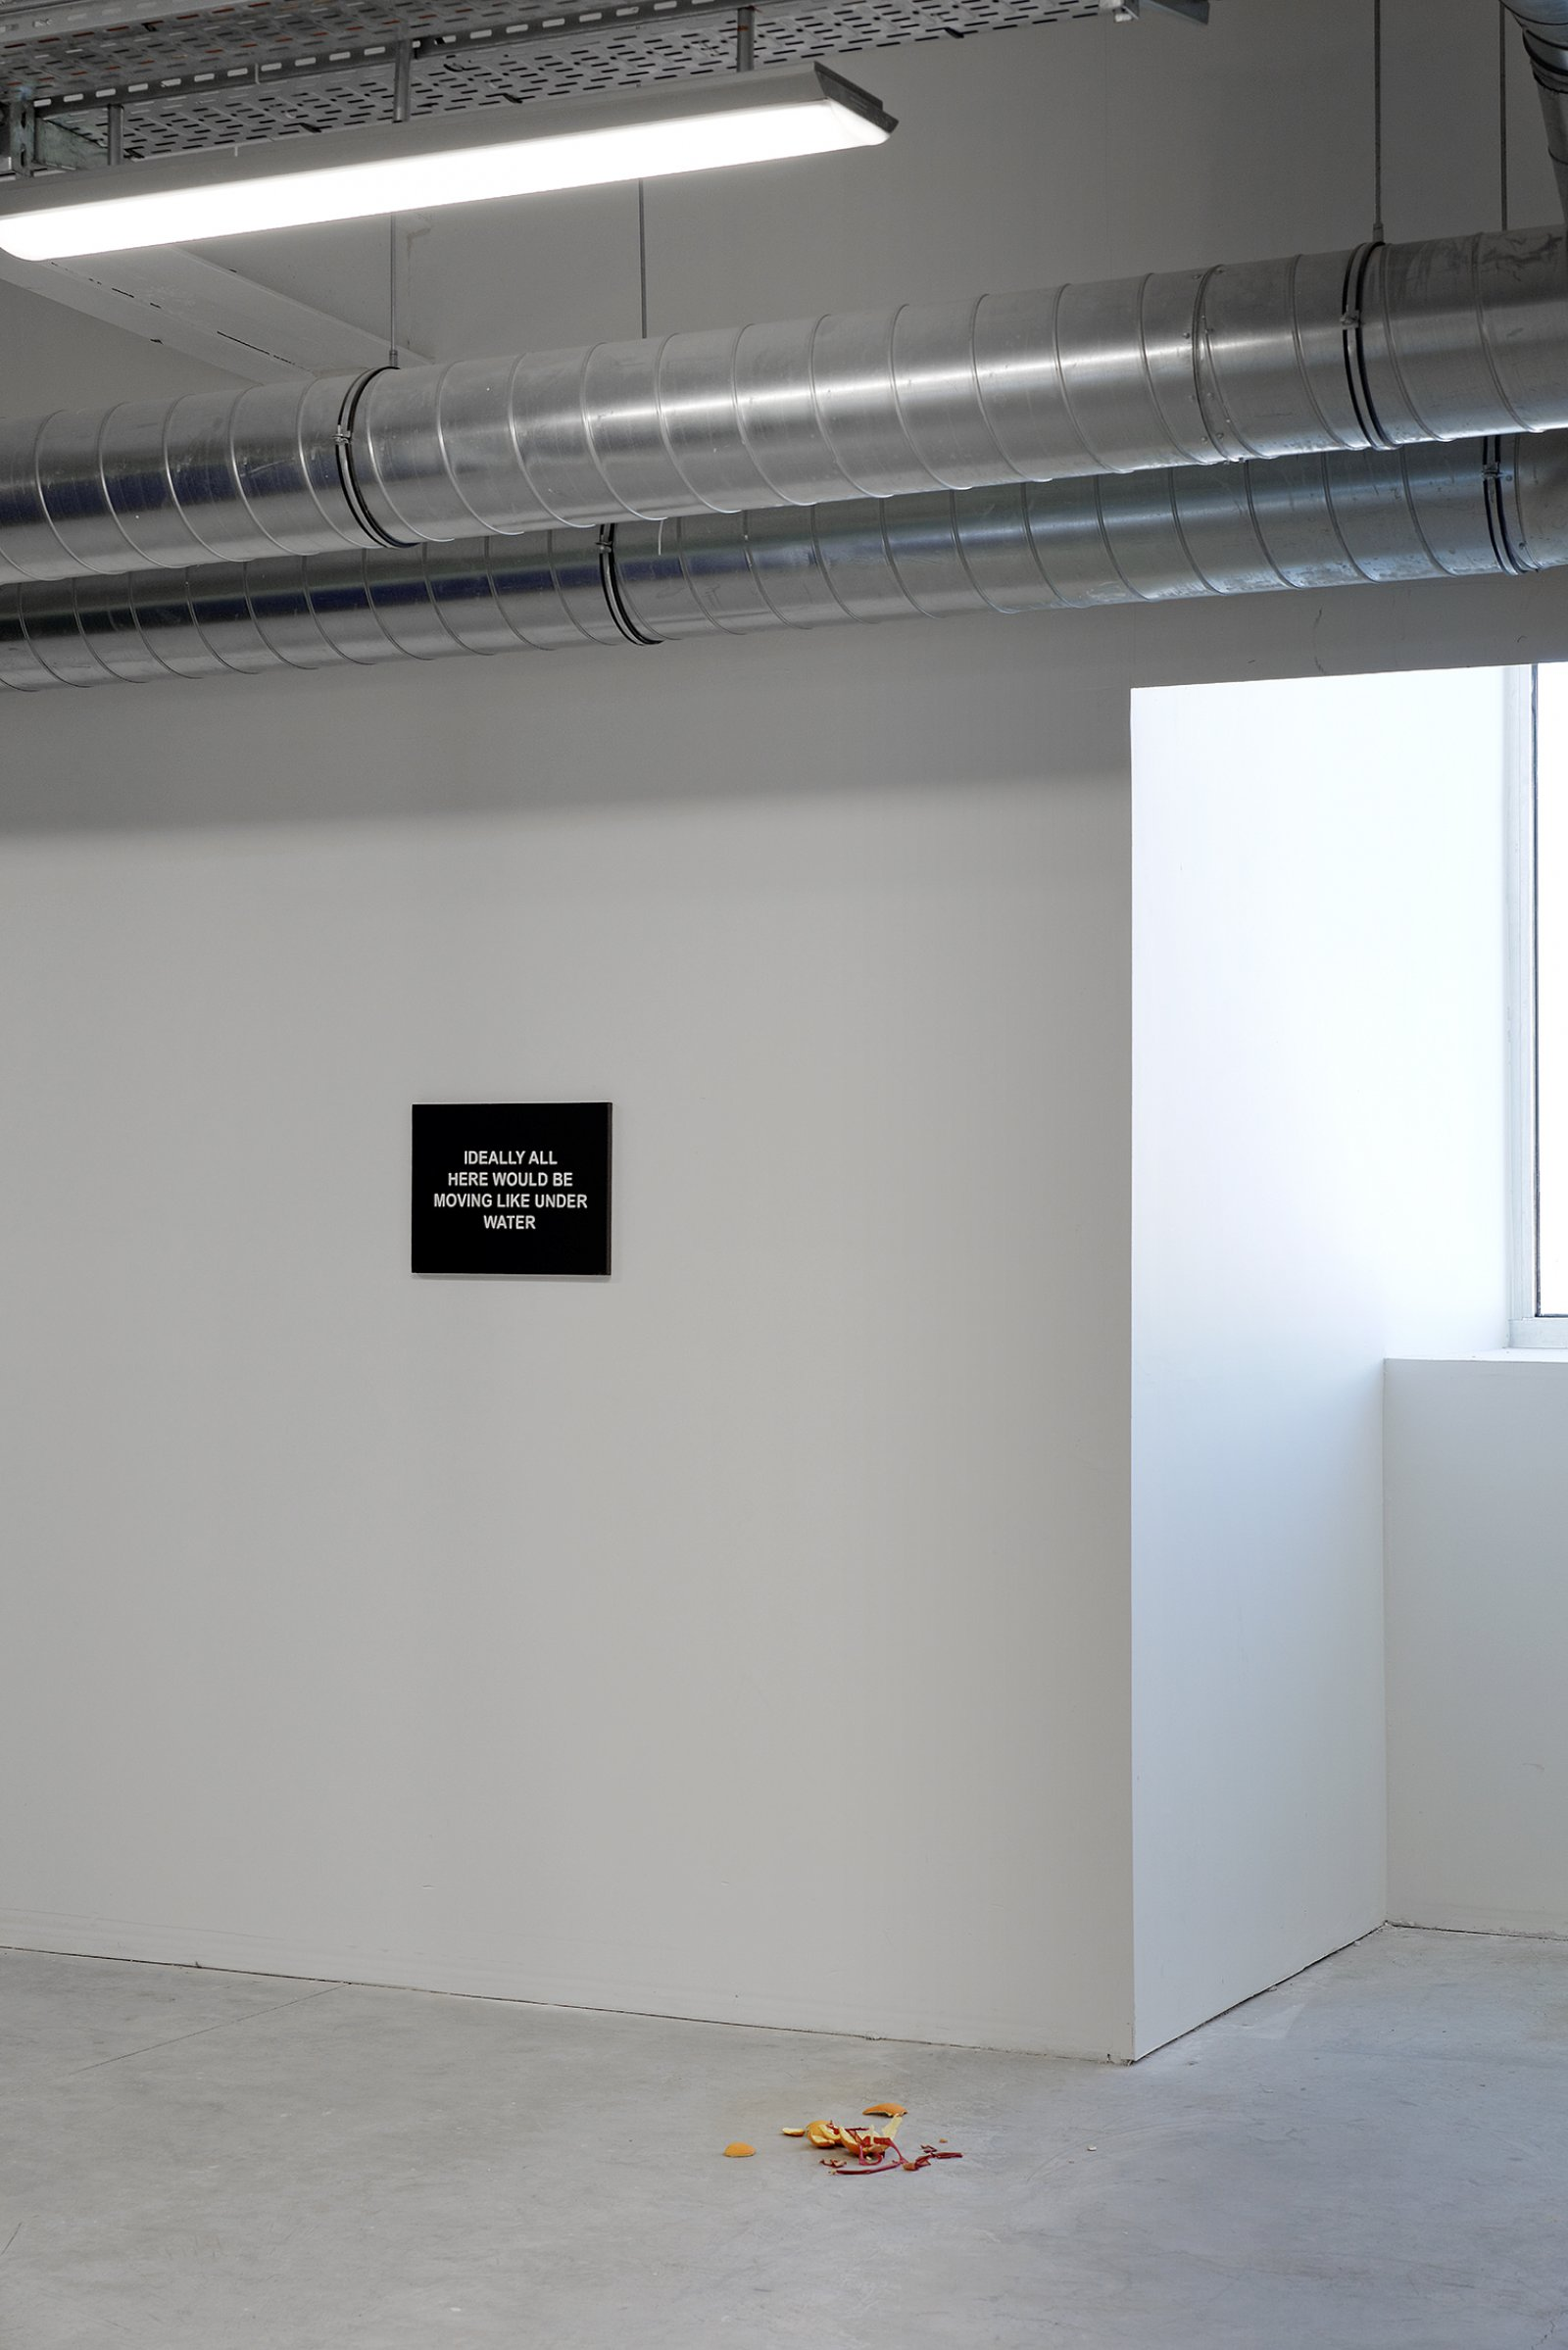 Installation view, No Fear, No Shame, No Confusion, Triangle France, Marseilles, 2013 by Liz Magor